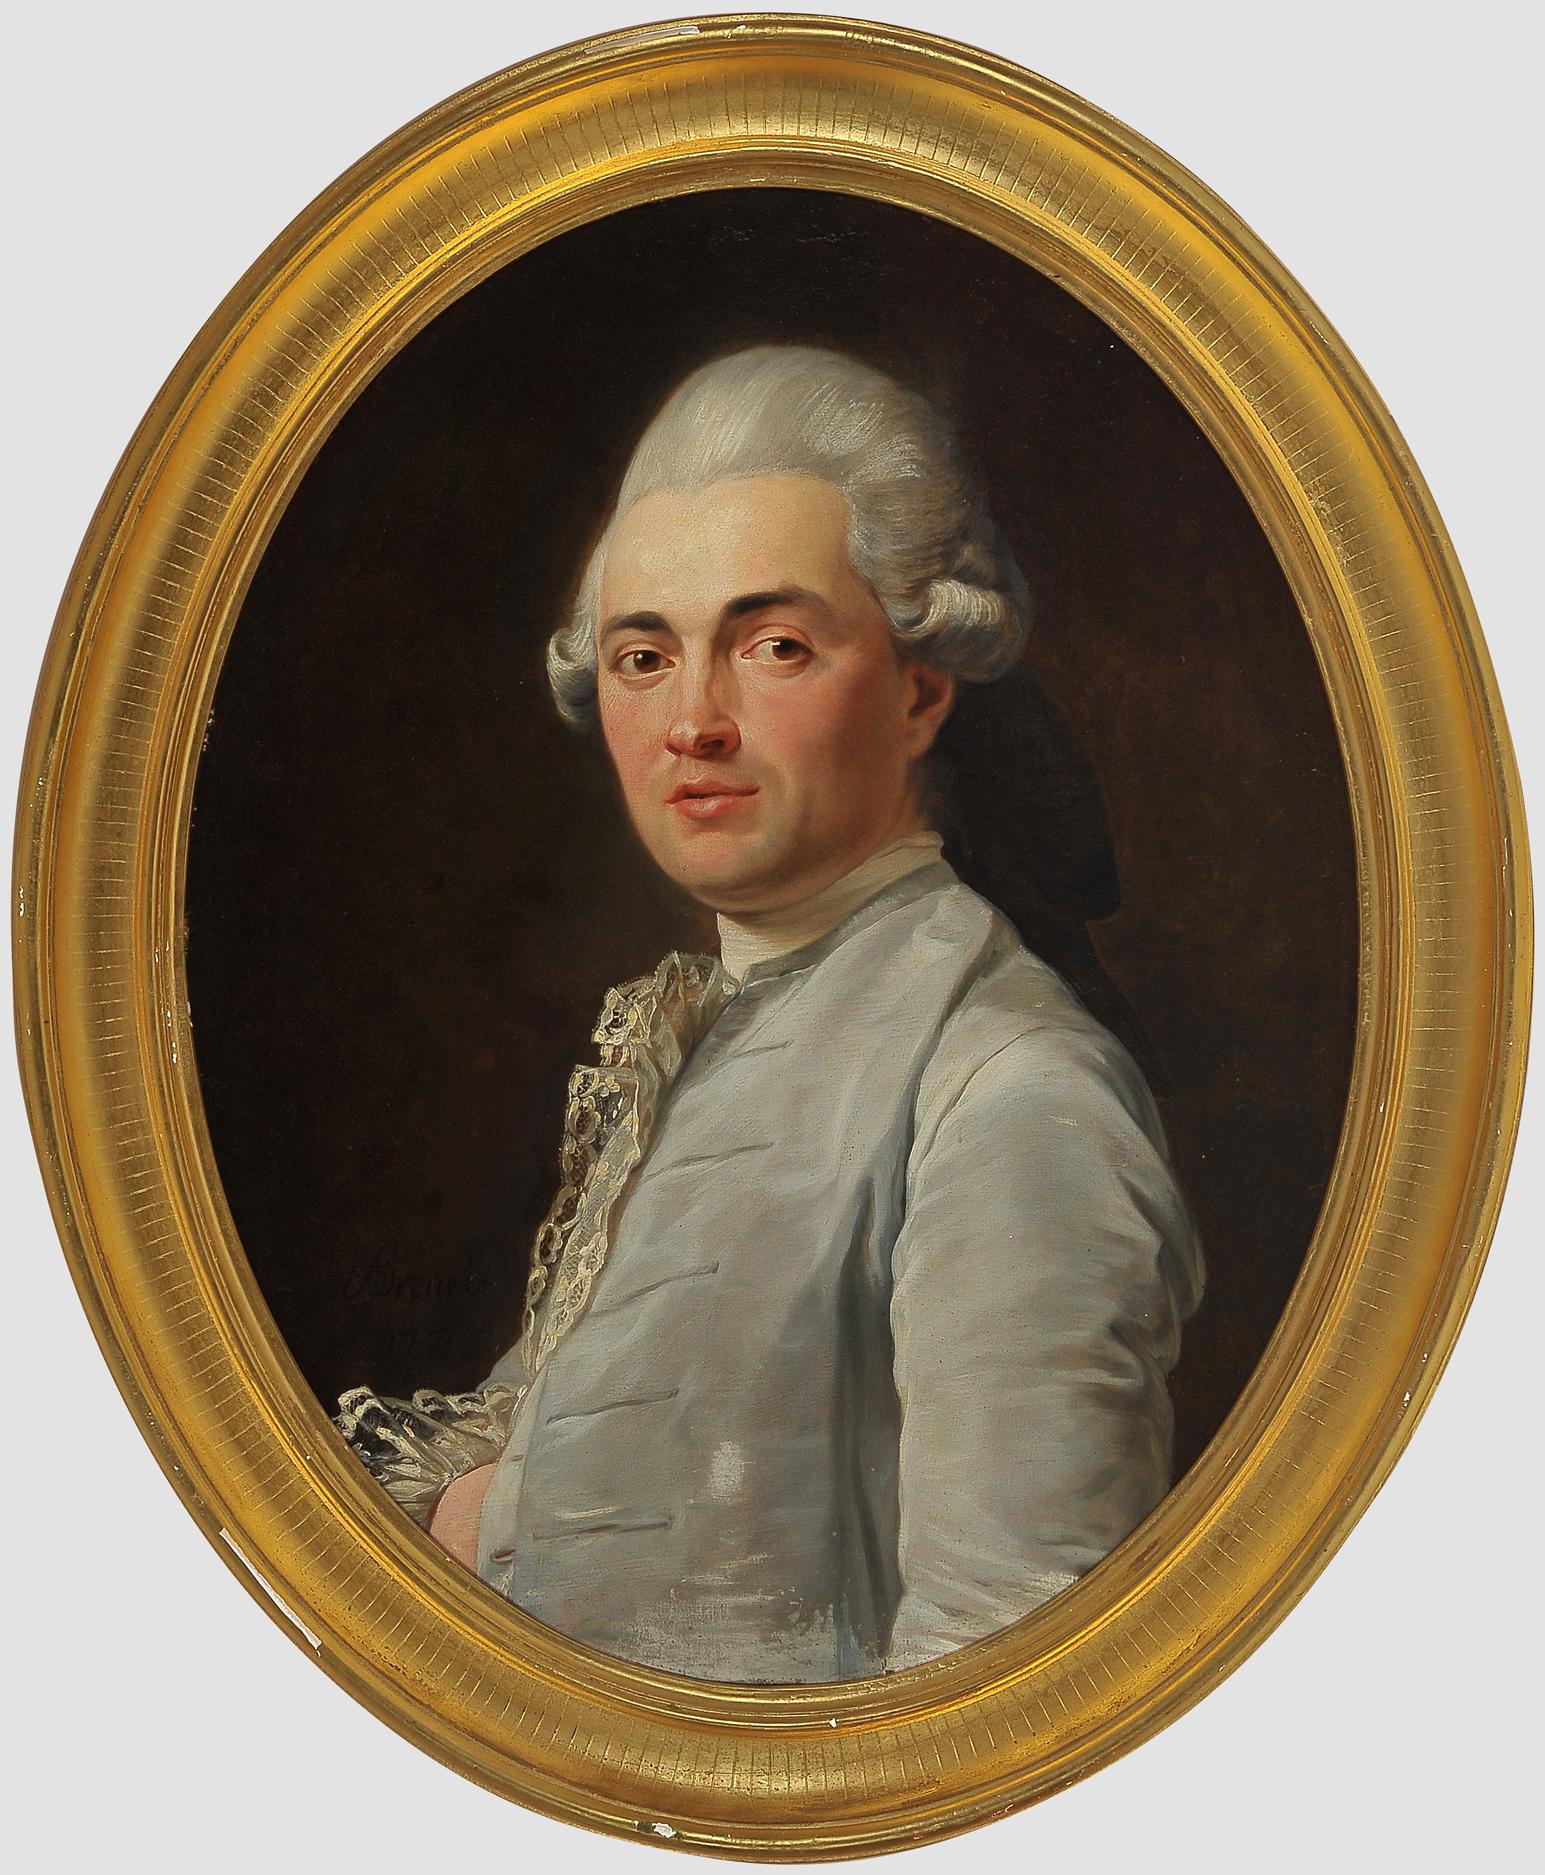 "Nicolas Guy Brenet, Paris 1728 – 1792 Paris, Portraits des Ehepaares ""Von Schauenstein"" - Image 2 of 11"